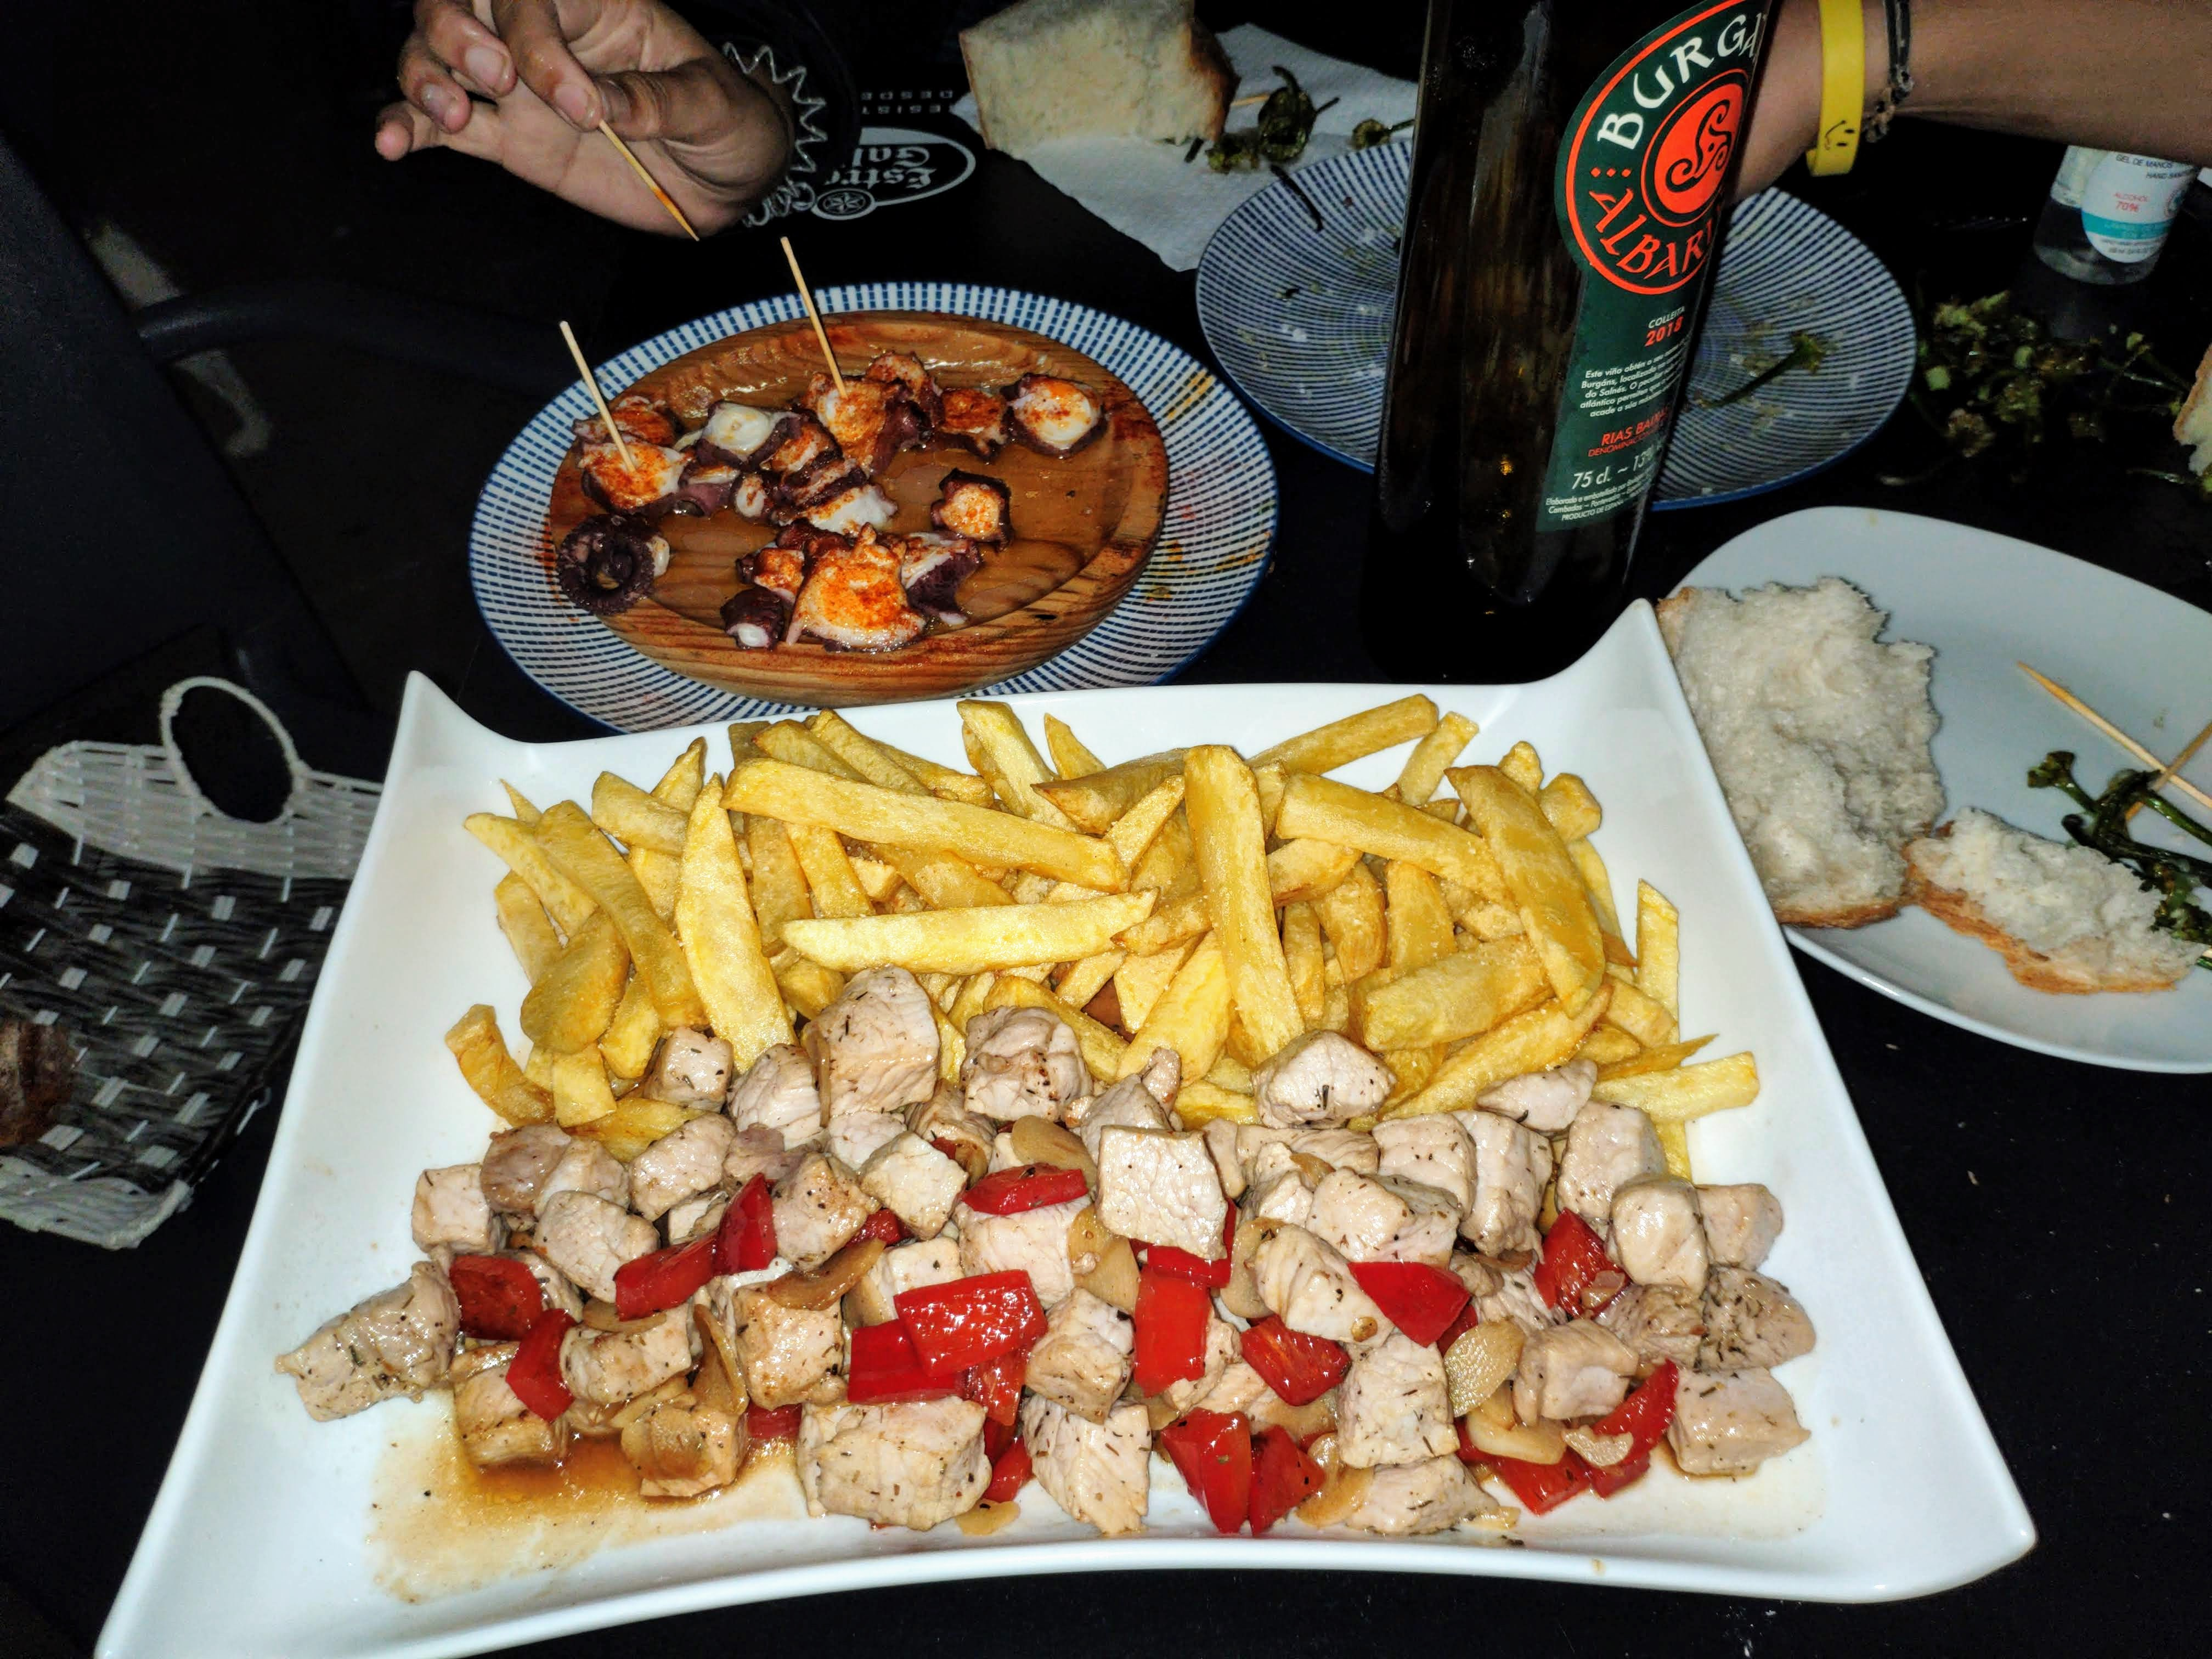 https://foodloader.net/nico_2020-09-16_schweinegeschnetzeltes-mit-pommes-frites.jpg